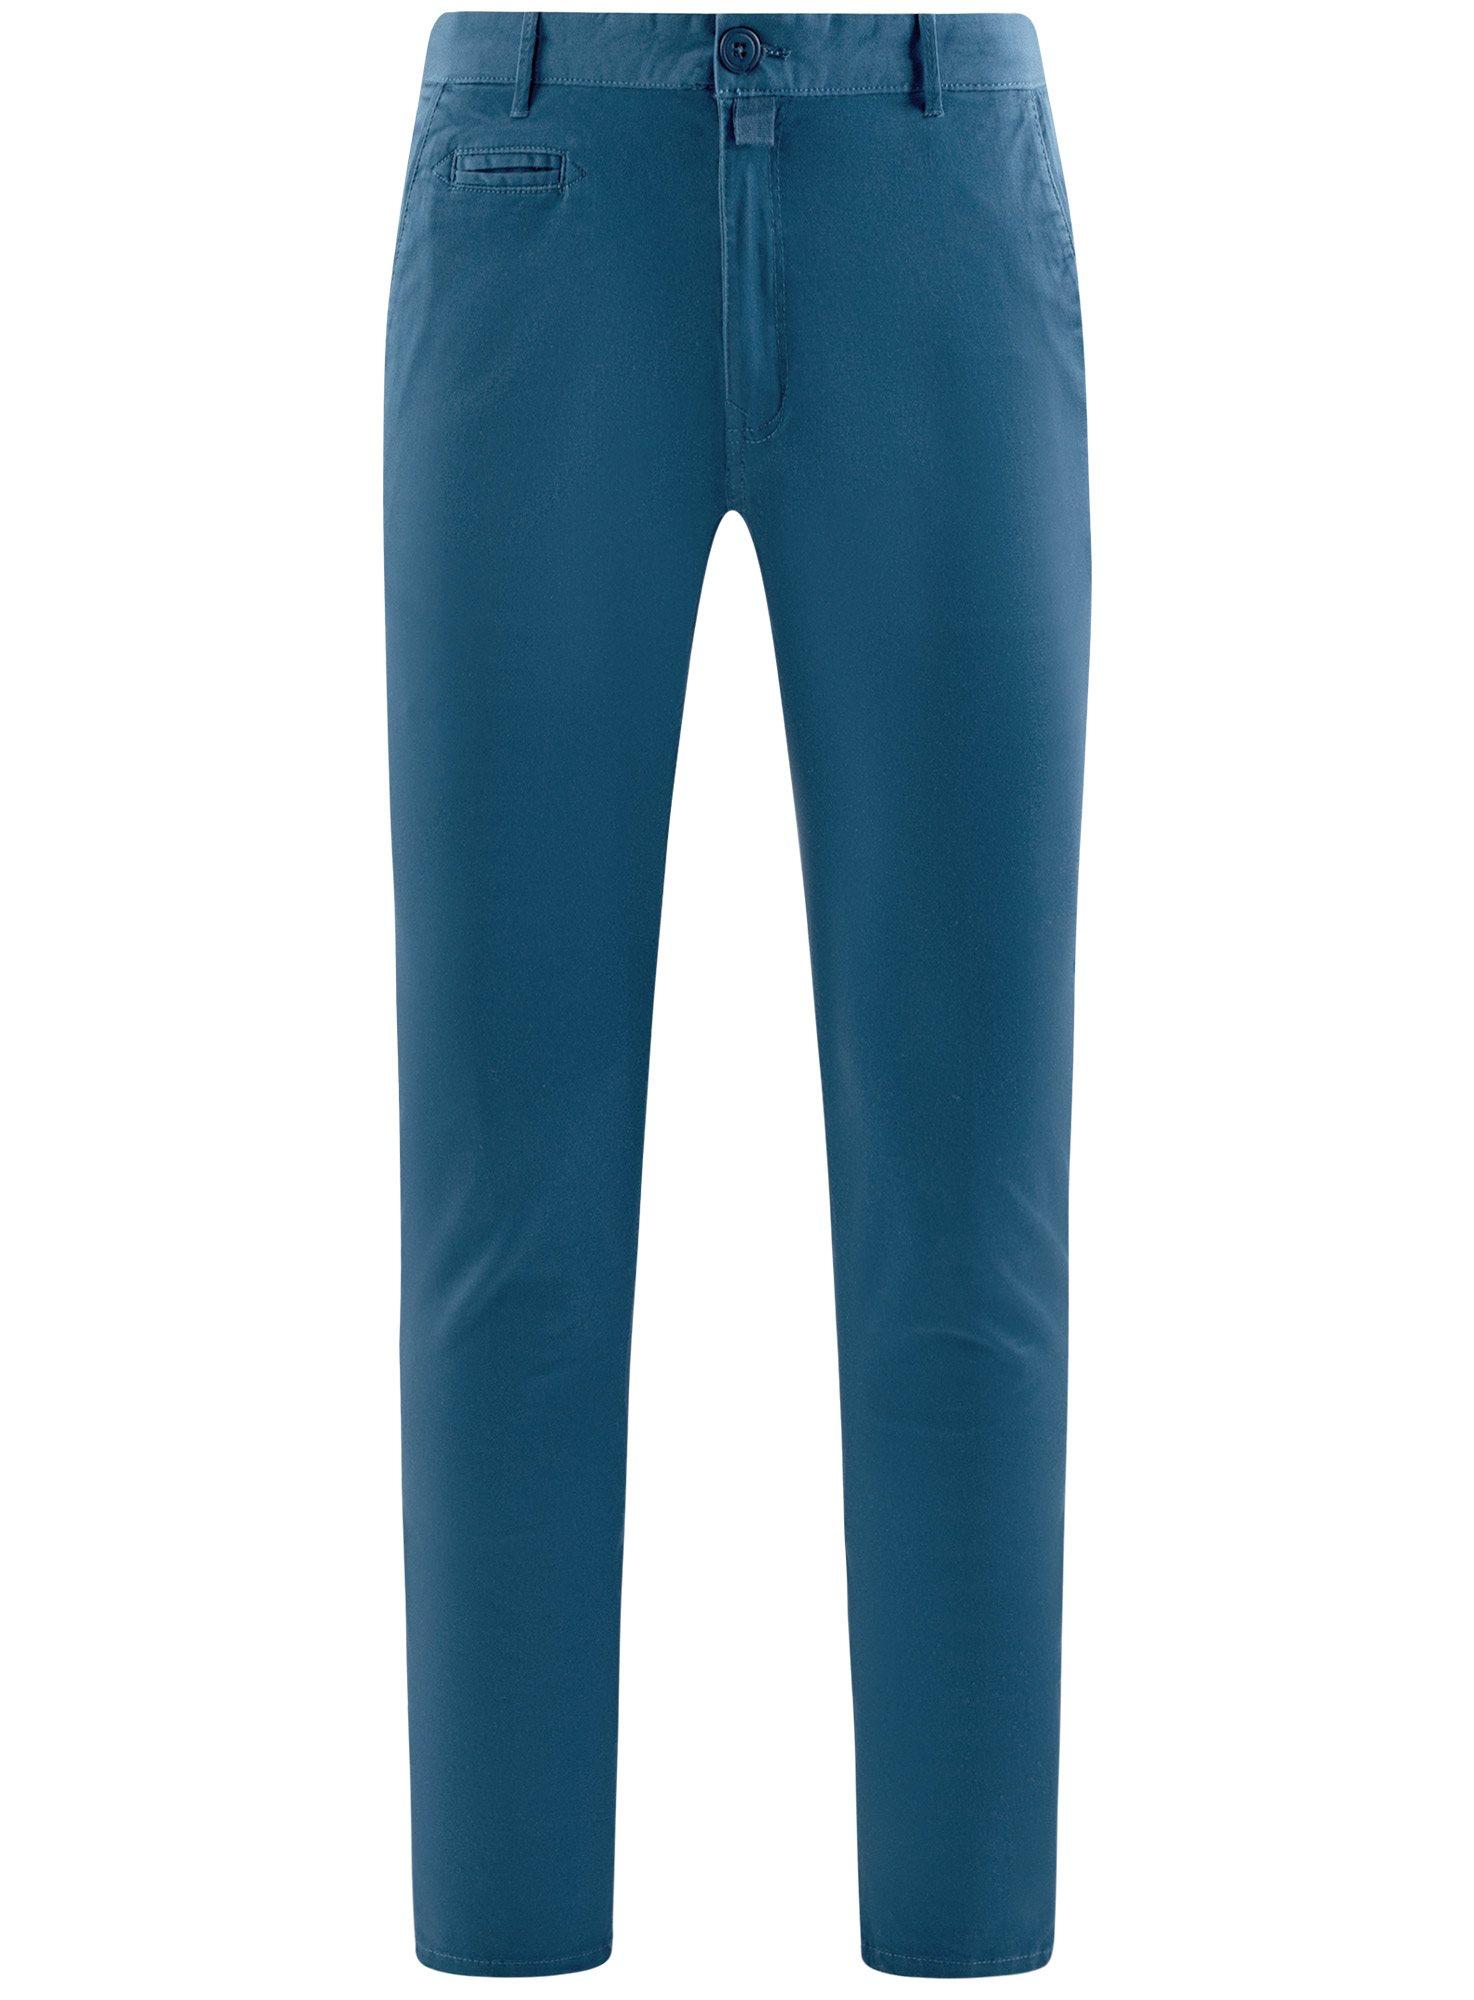 Брюки-чиносы хлопковые oodji для мужчины (синий), 2B150006M/39139N/7500N